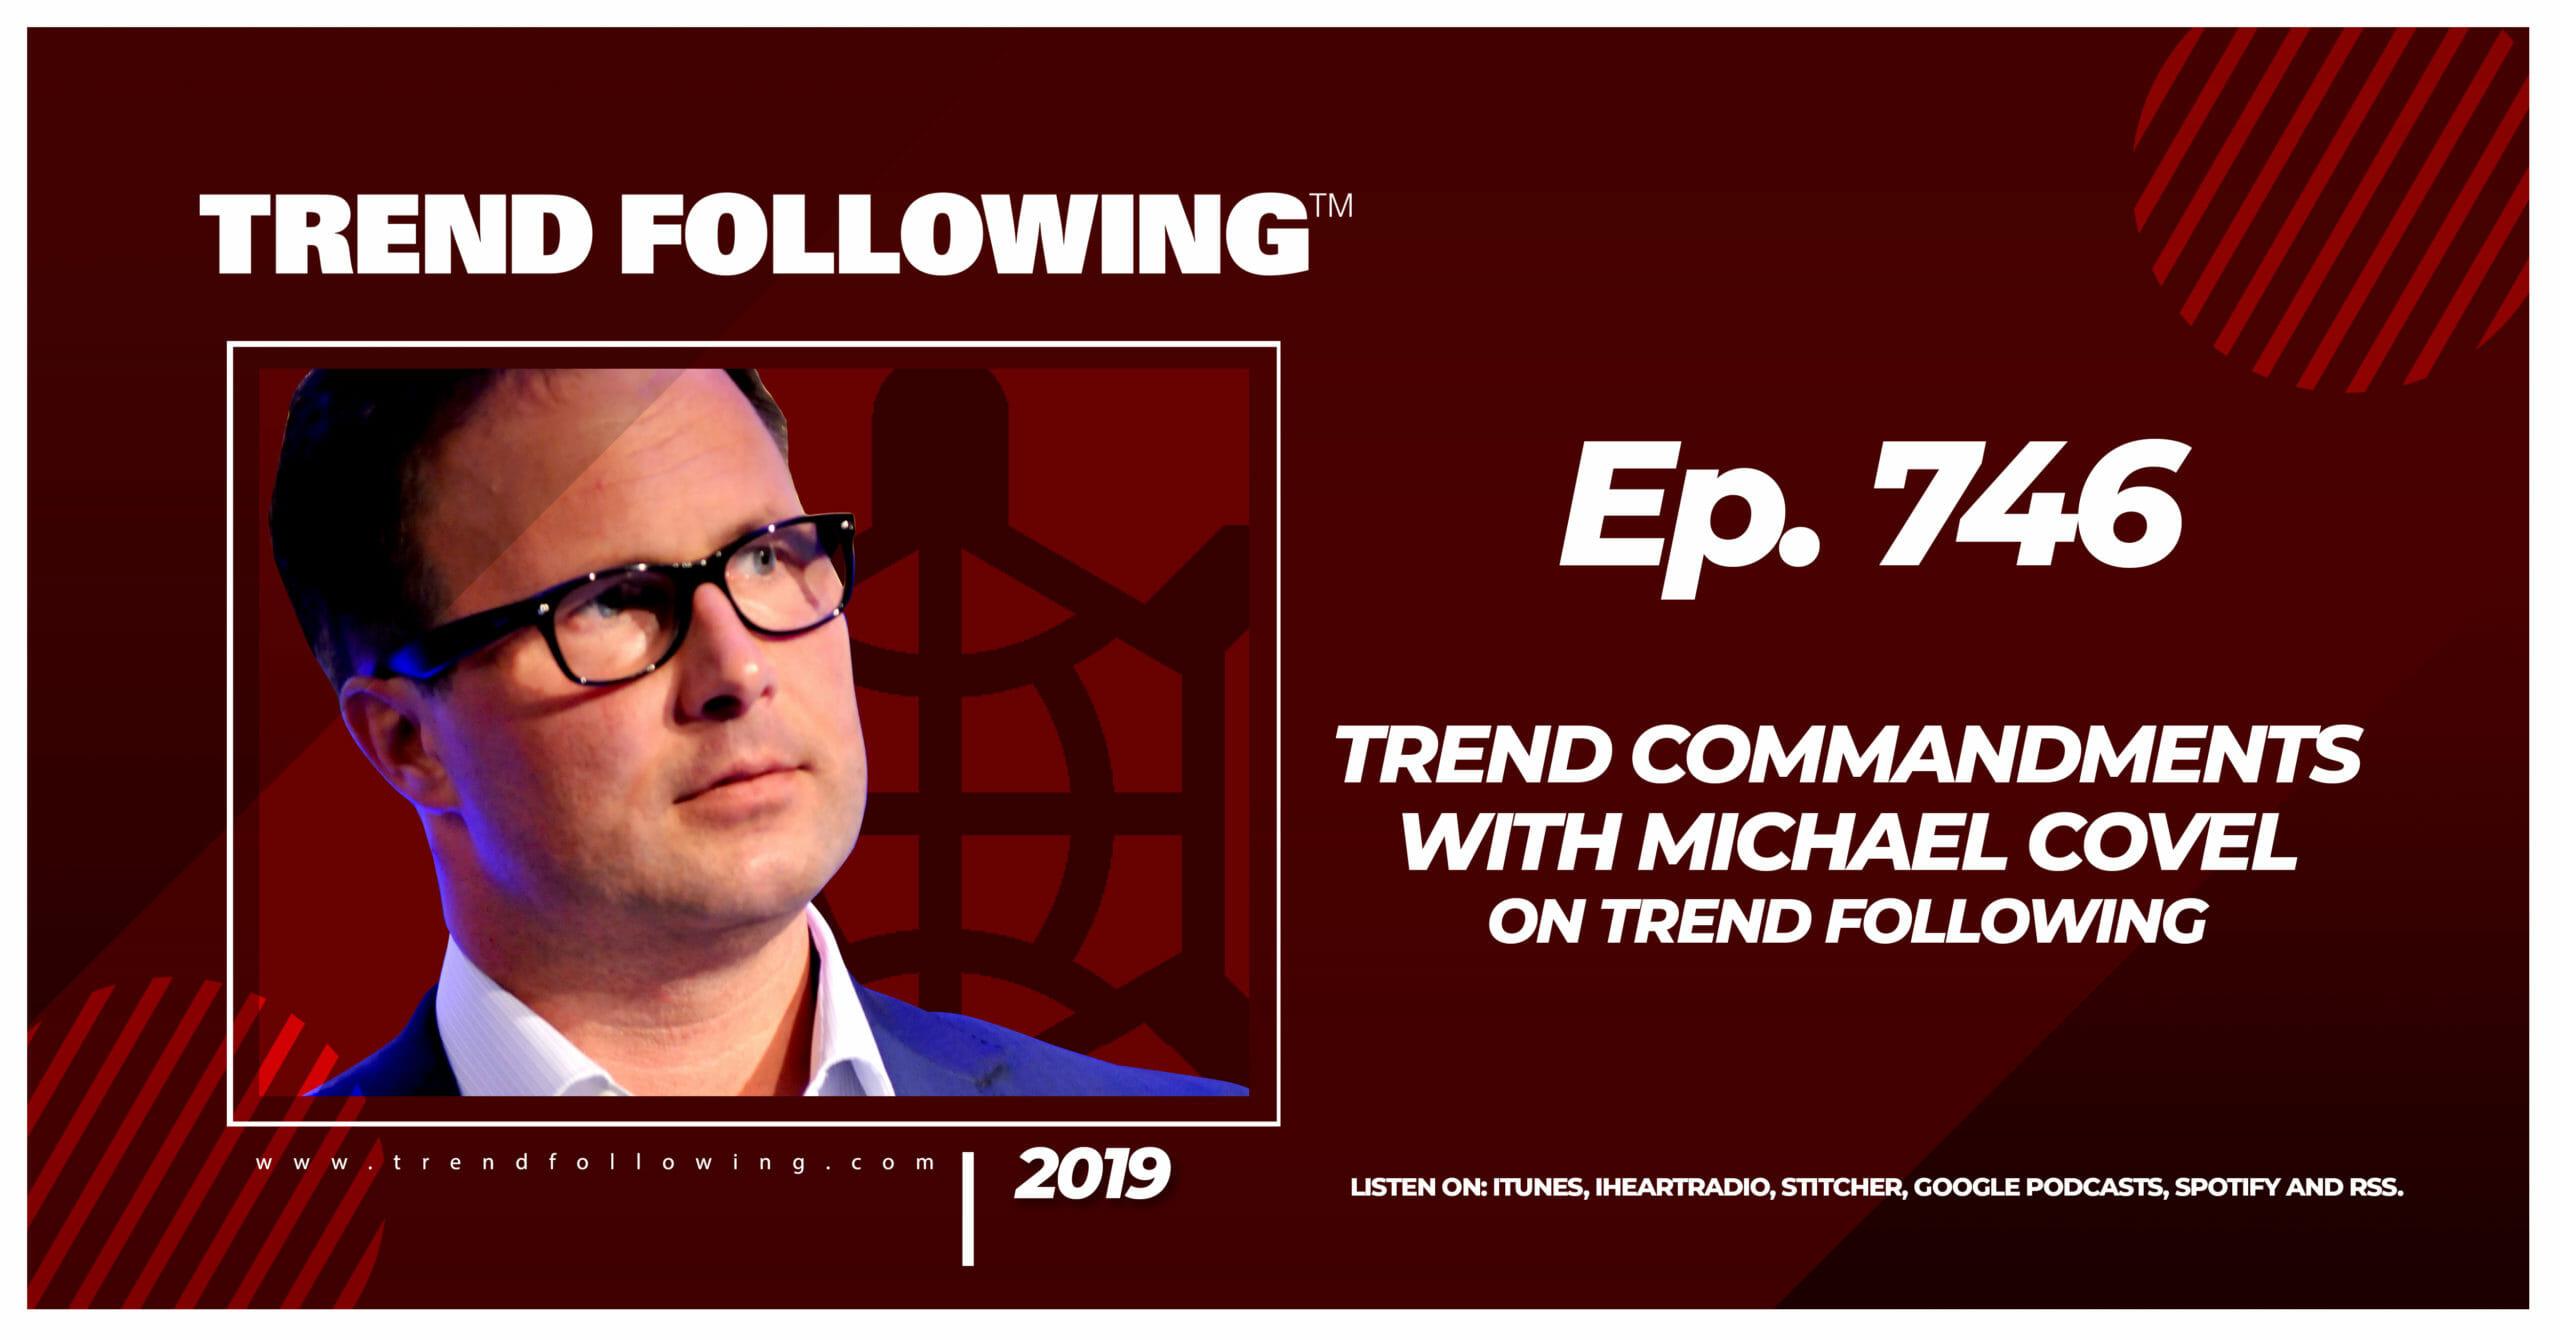 Trend Commandments with Michael Covel